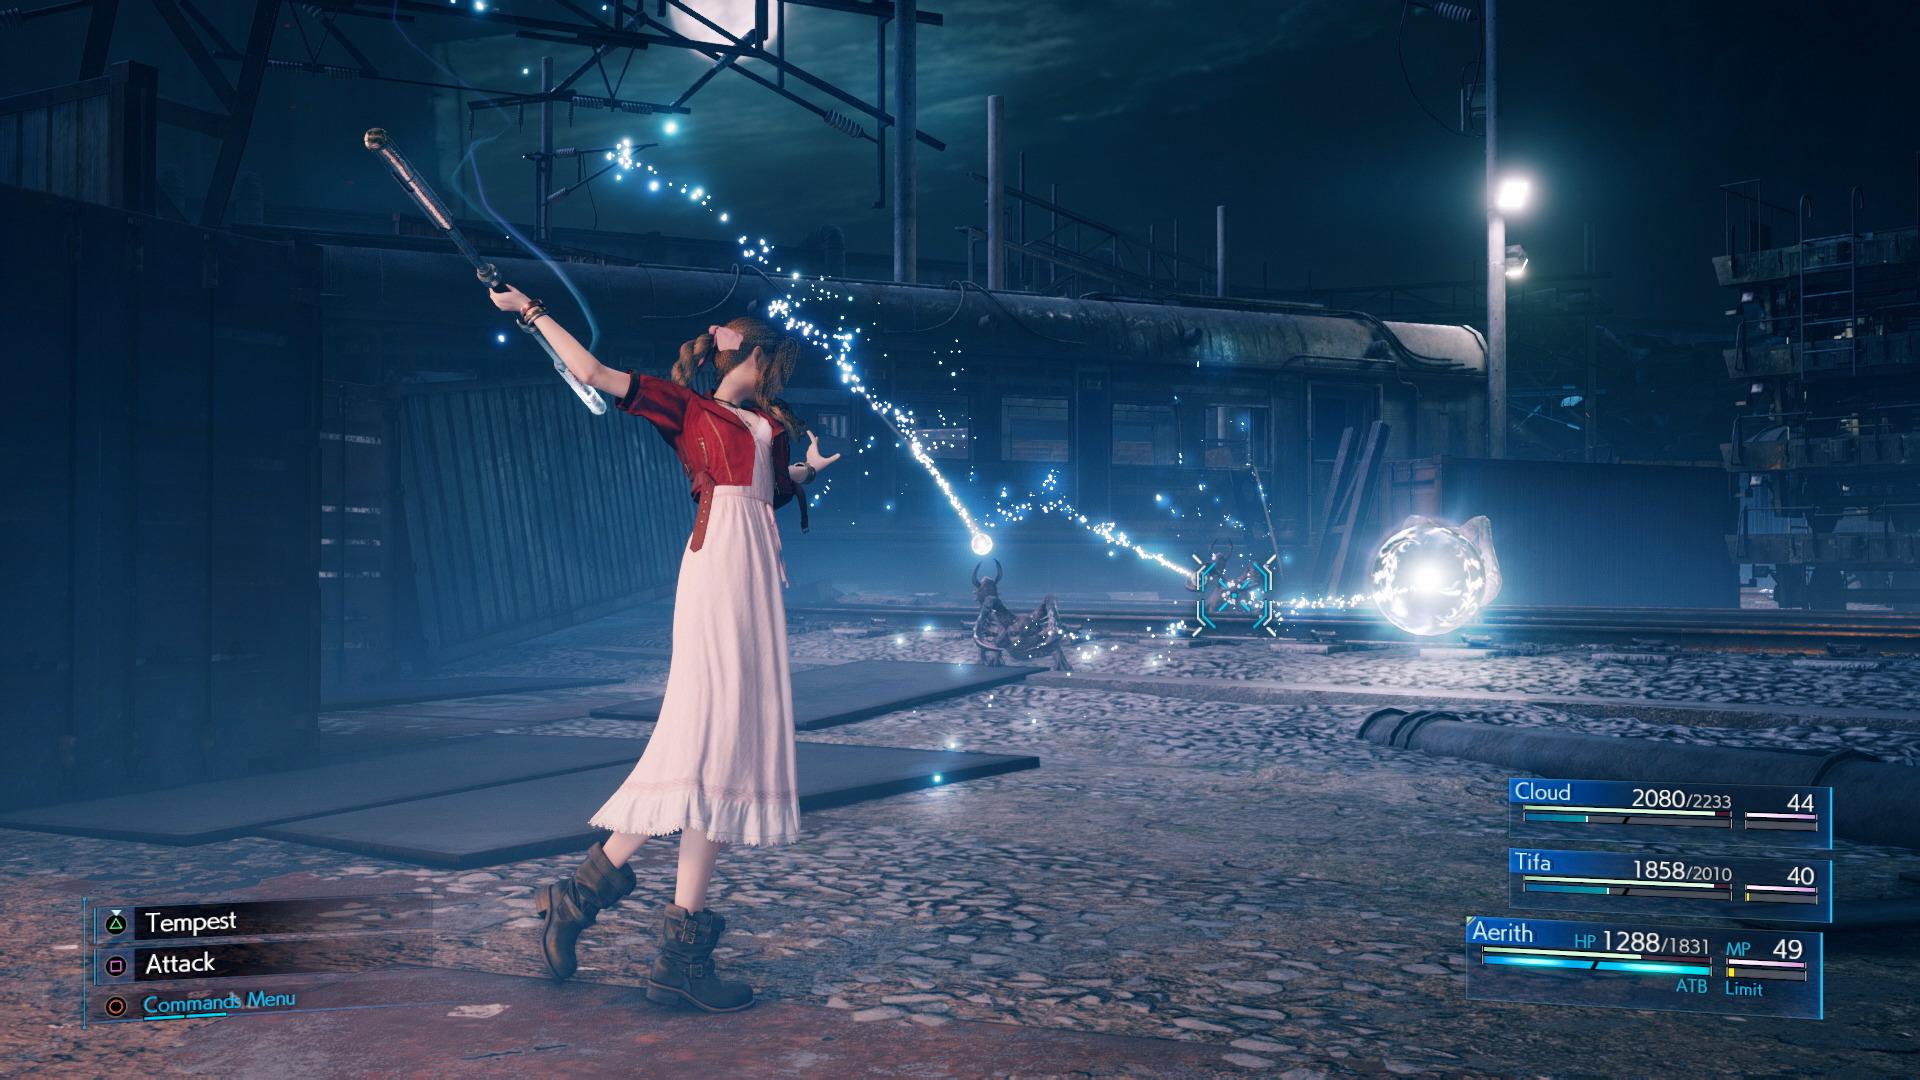 Aerith's combat - normal attack